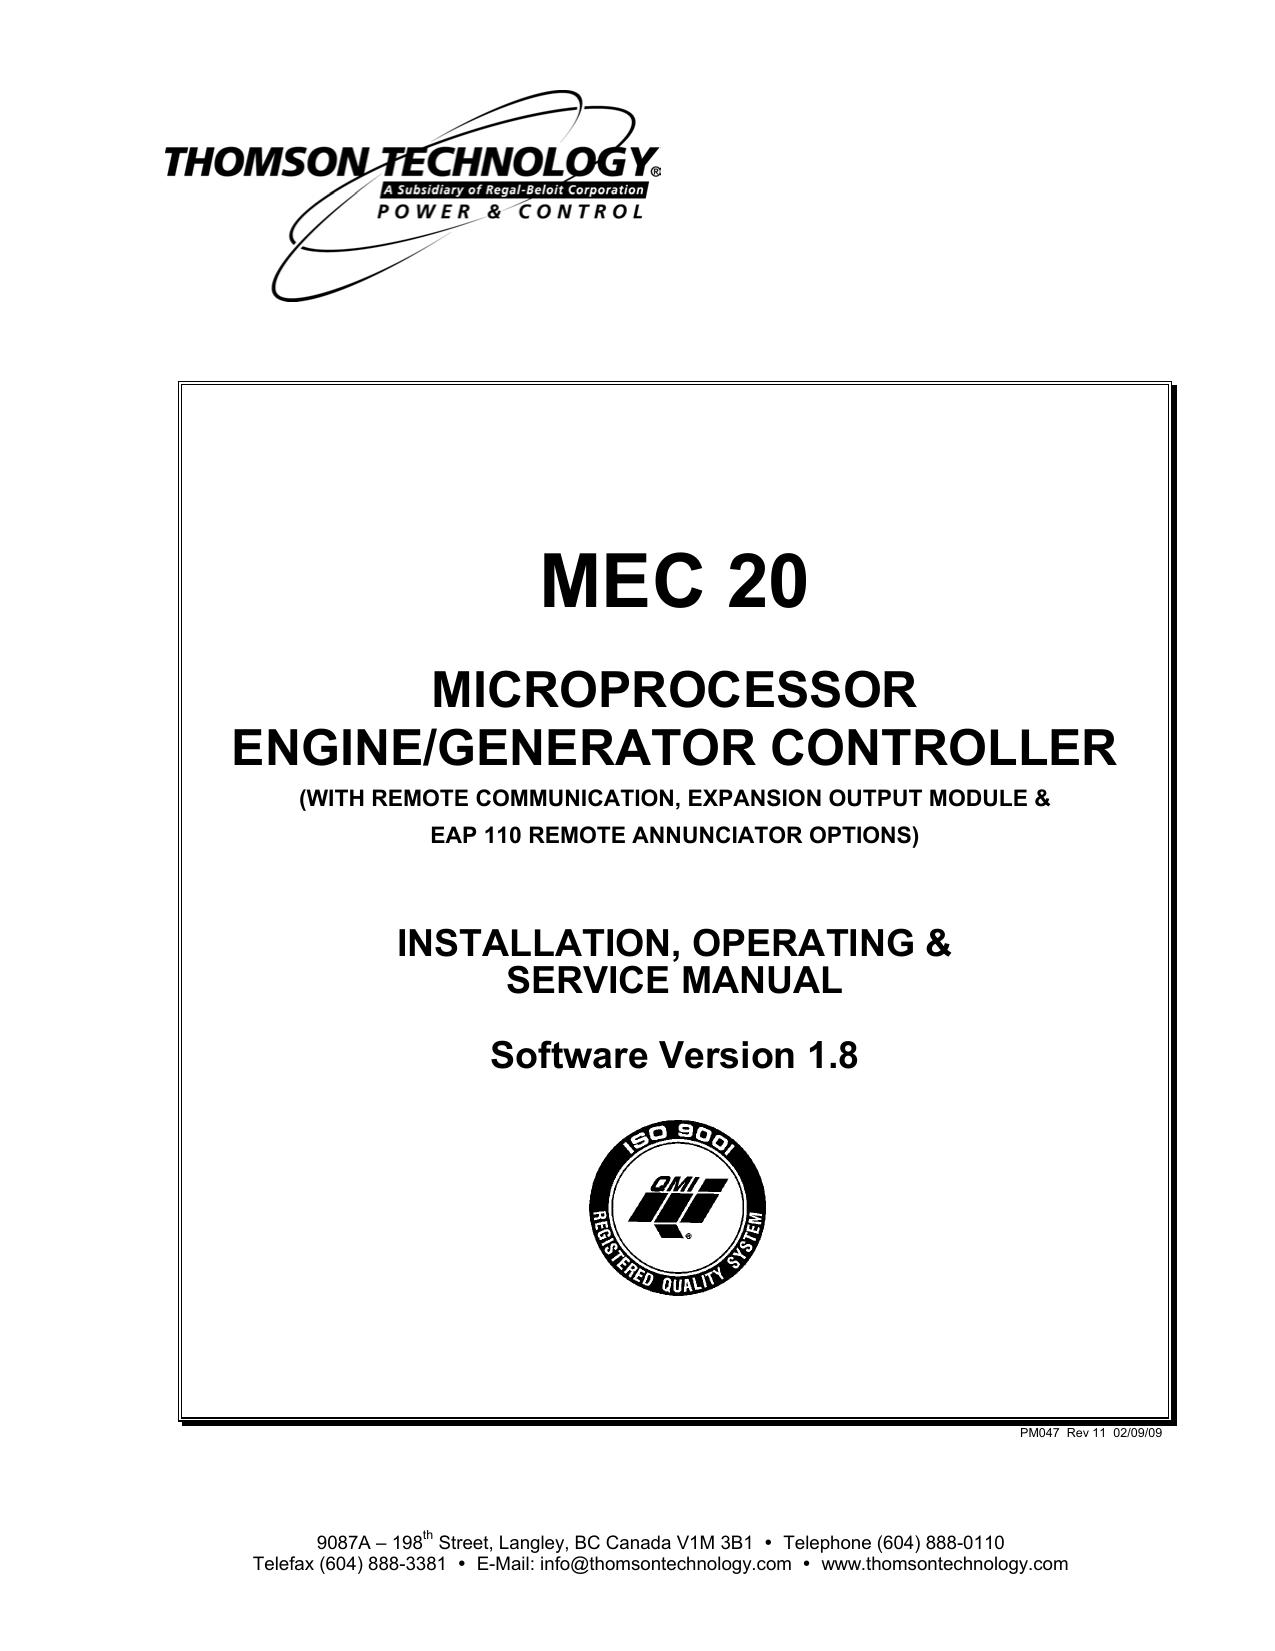 Mec 310 Wiring Diagram For Generator Data Circuit Store Gtgt 944 2 Brake System Rear 20 Baldor Com Rh Studylib Net Ac Connection